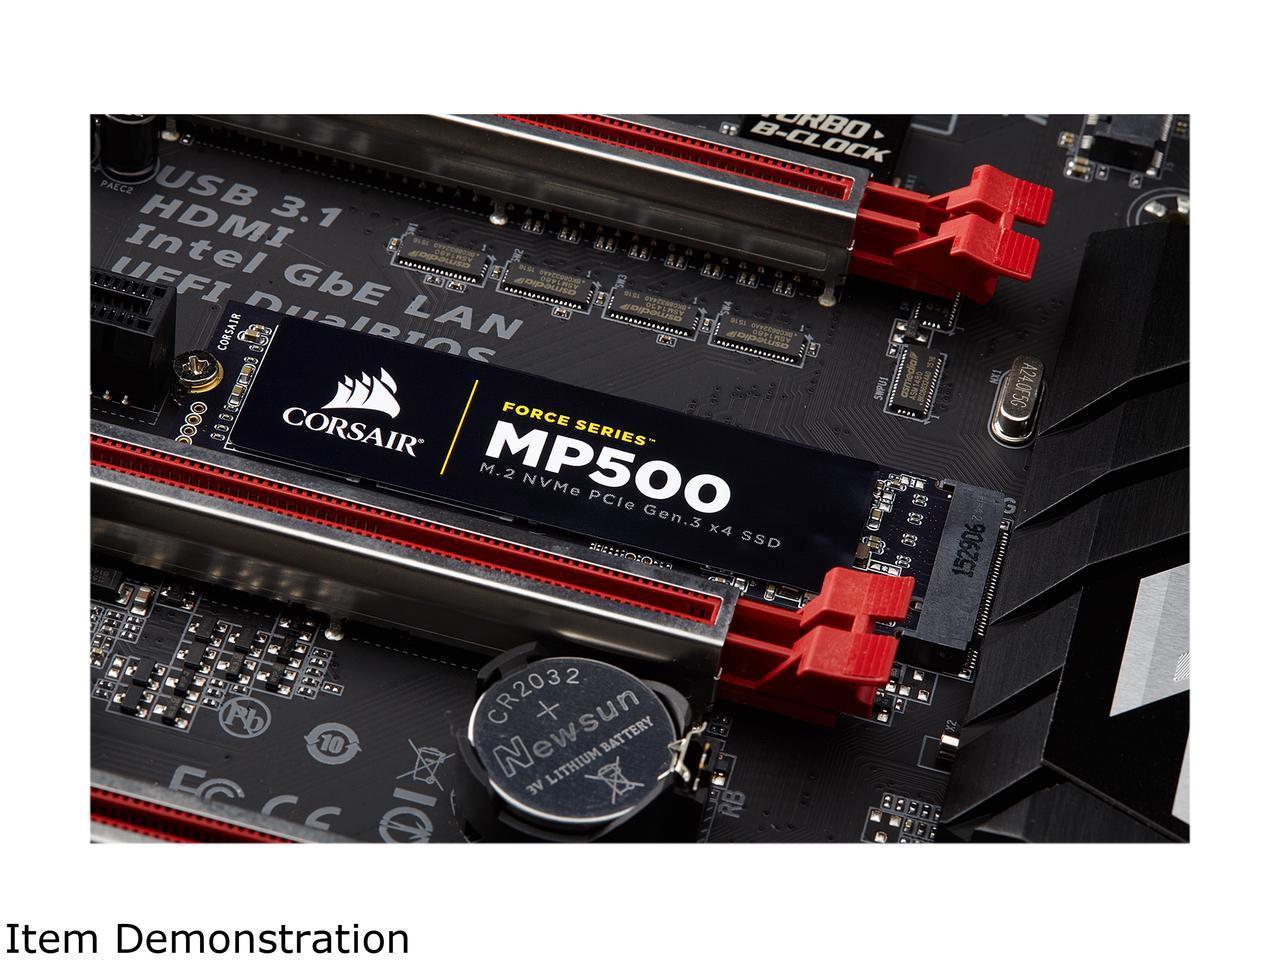 Corsair SSD Force Series MP500 M.2 2280 240GB NVMe PCI-Express 3.0 x4 MLC 240G PCIe Gen. 3 Internal Solid State Drive CSSD-F240GBMP500 3